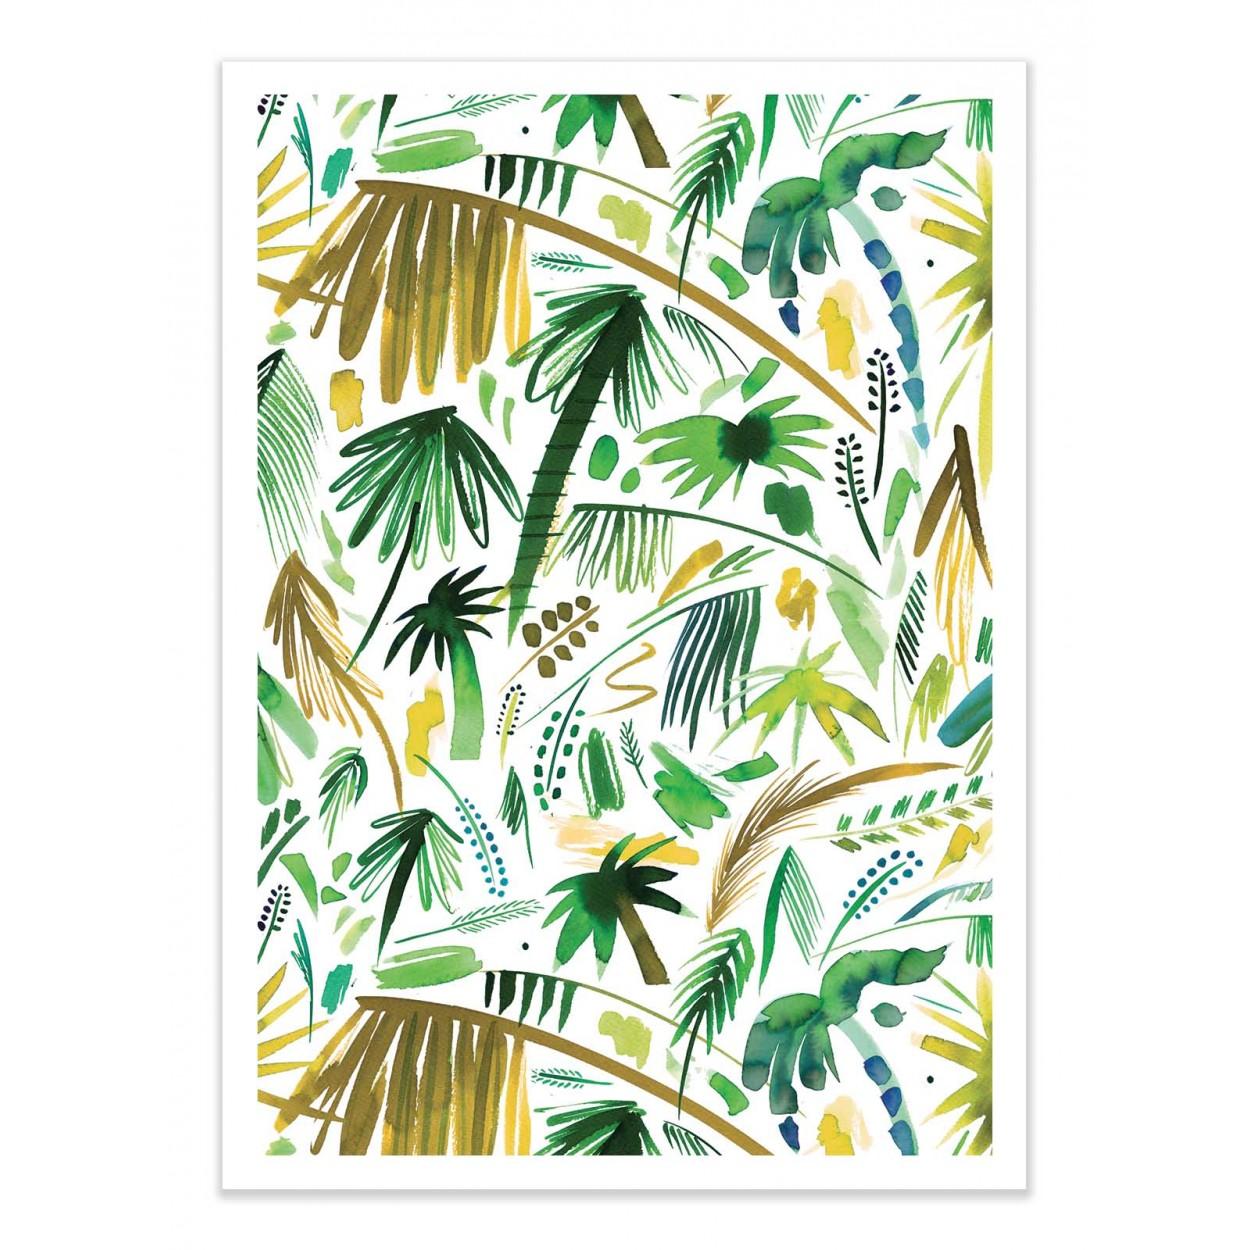 BRUSHSTROKES PALMS GREEN -   Affiche d'art 50 x 70 cm